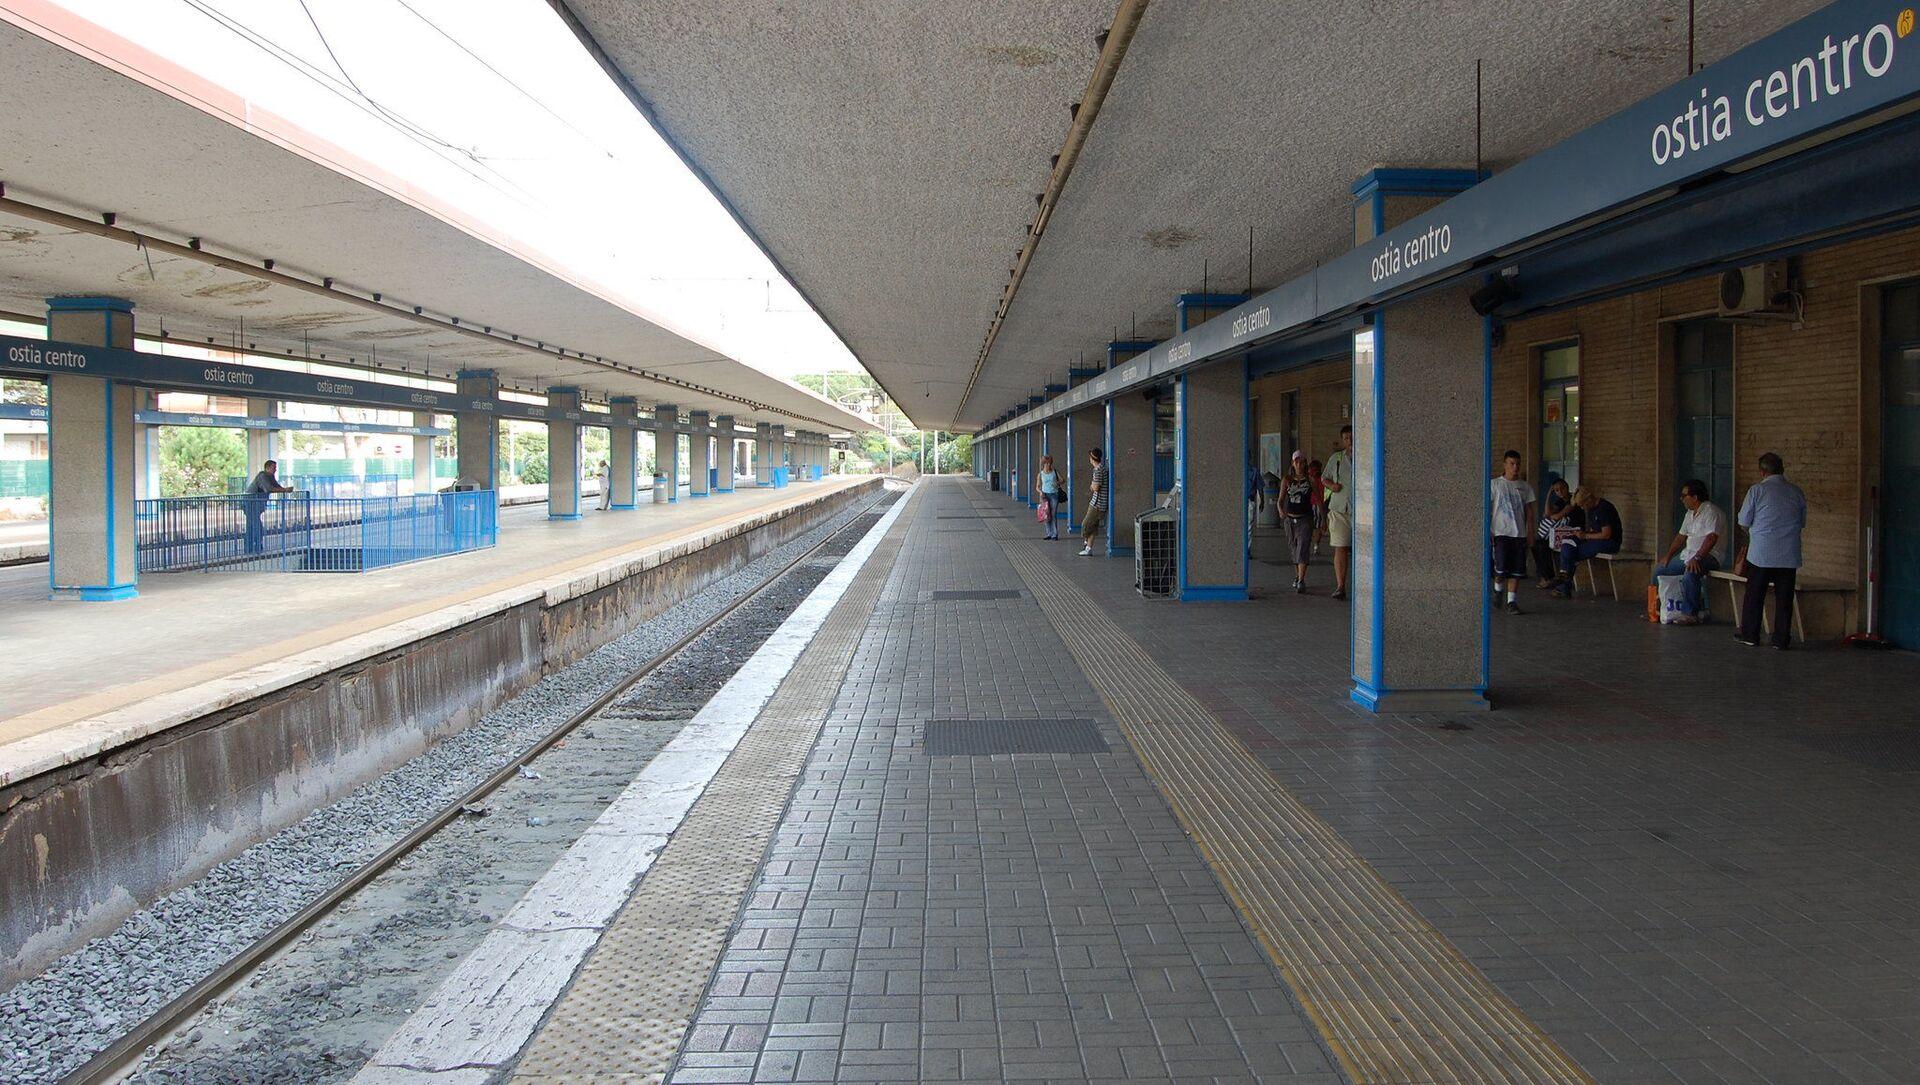 Stazione di Ostia Centro - Sputnik Italia, 1920, 07.04.2021